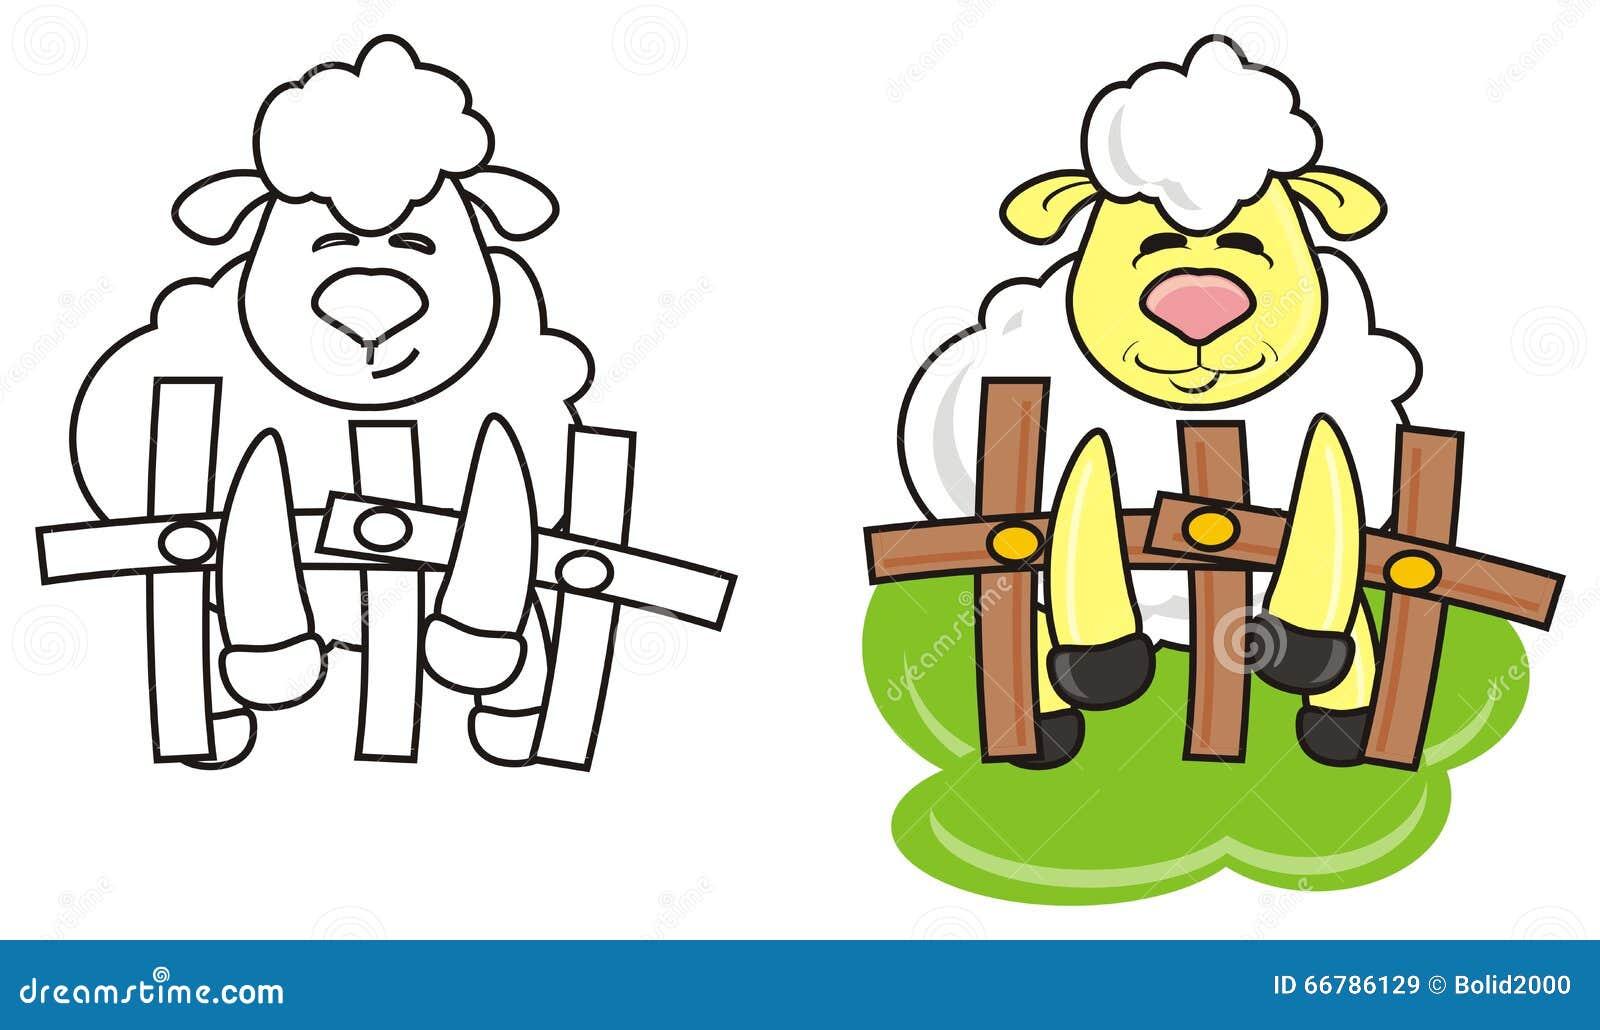 White lamb coloring